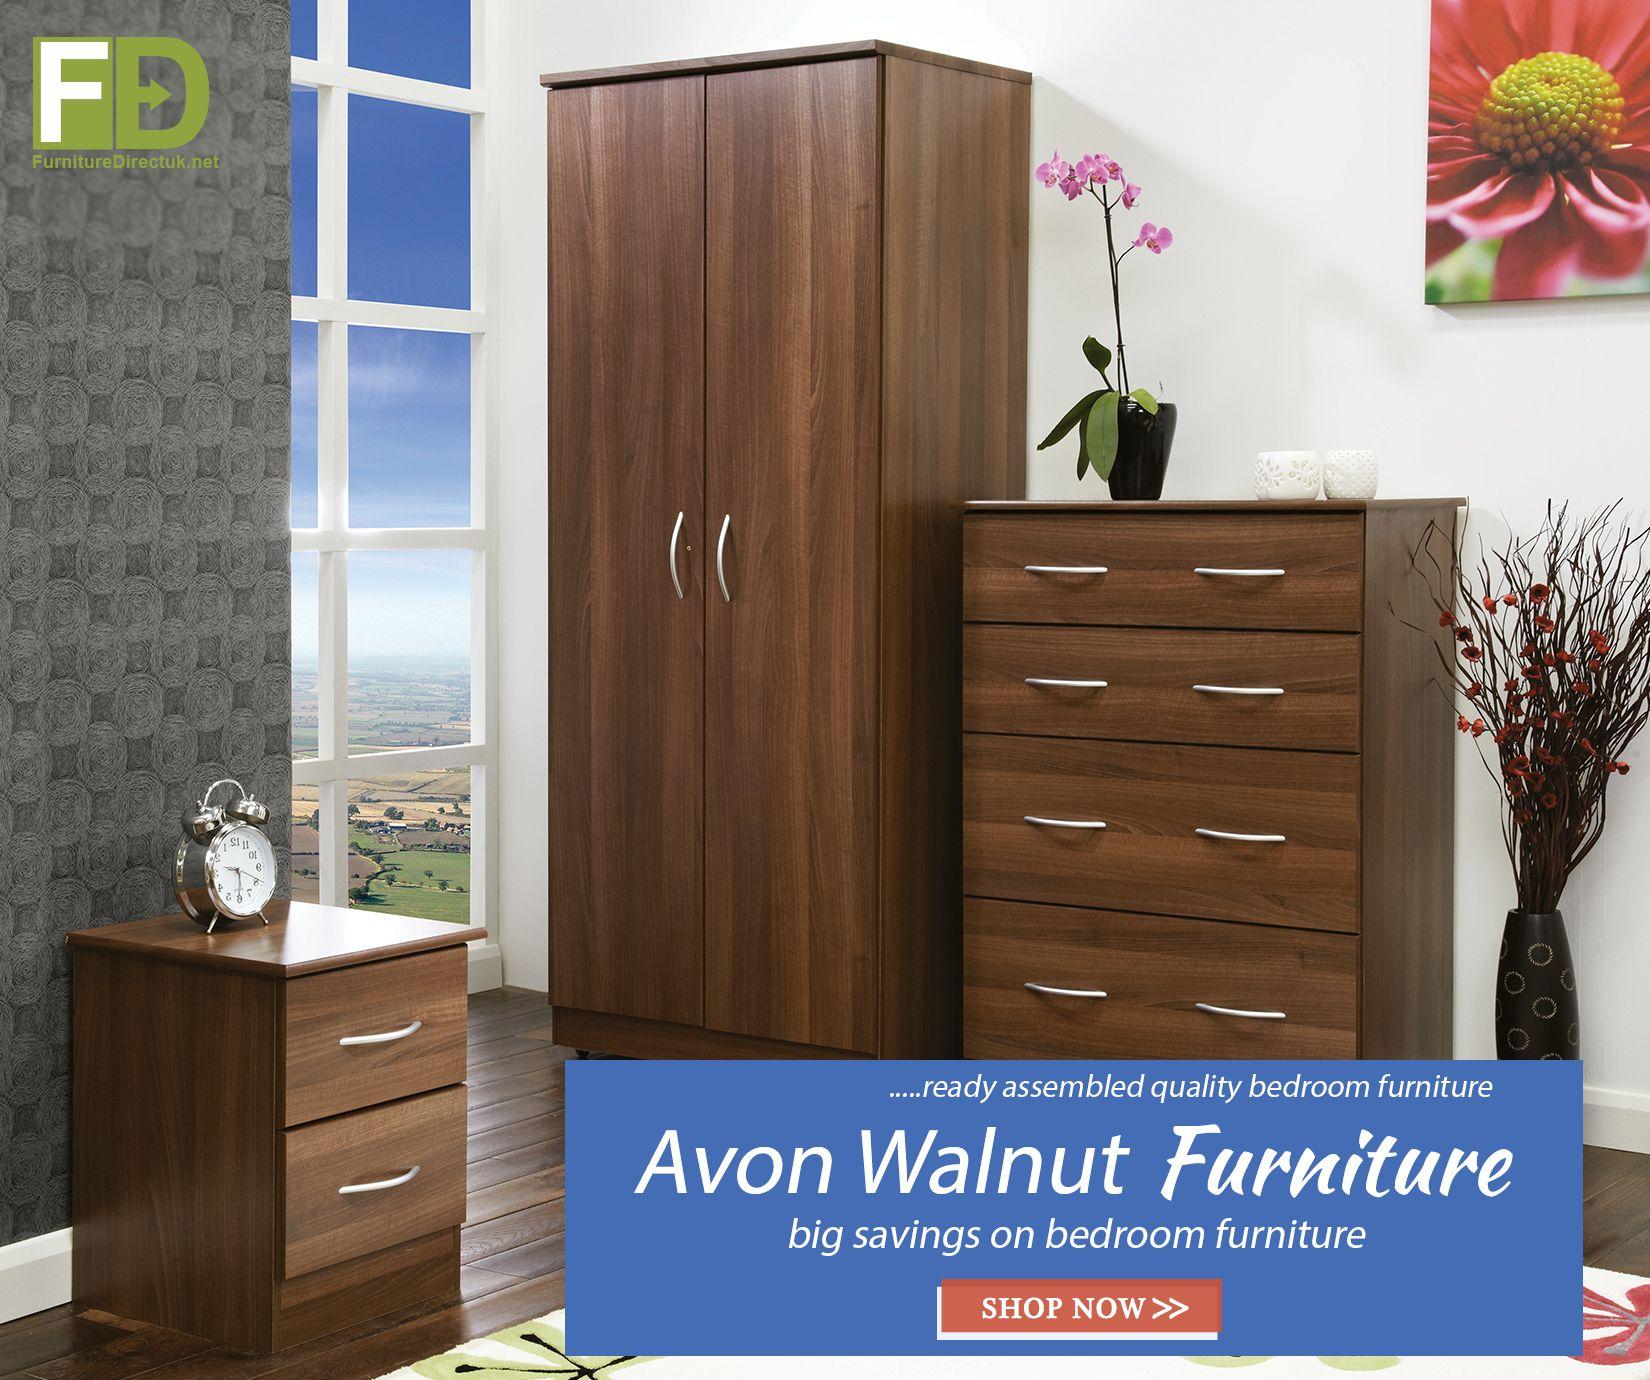 Sale 🤩🤩! Avon Walnut Bedroom 🛏️ Furniture